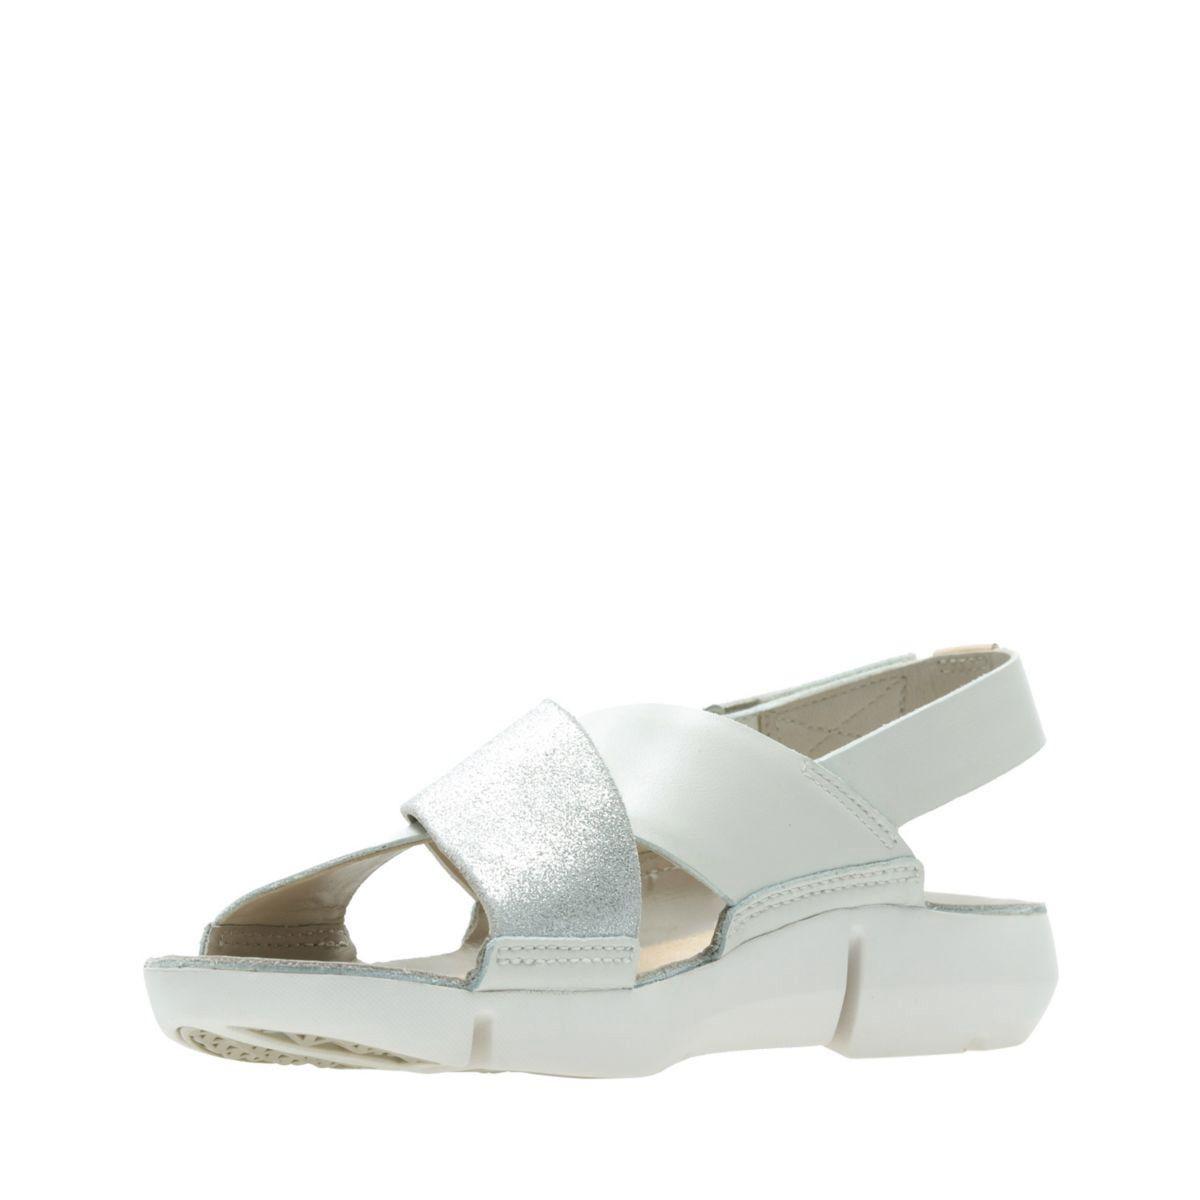 Corte Novela de suspenso alguna cosa  Clarks Tri Chloe - Womens Sandals White/Silver 8.5   Womens sandals, Shoe  care kit, Sandals